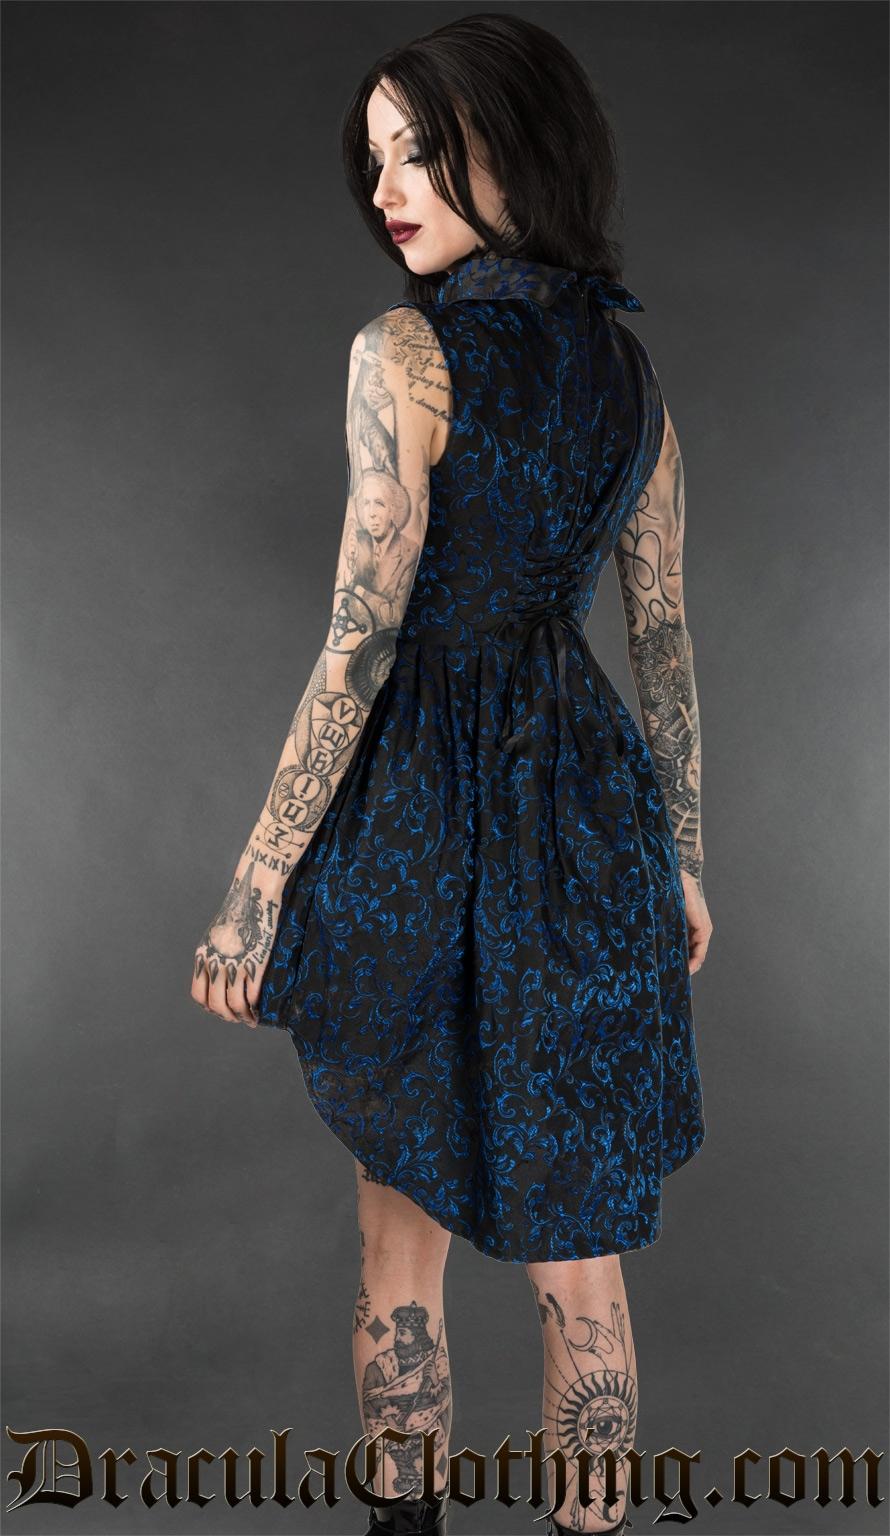 Sapphire Ankh Dress